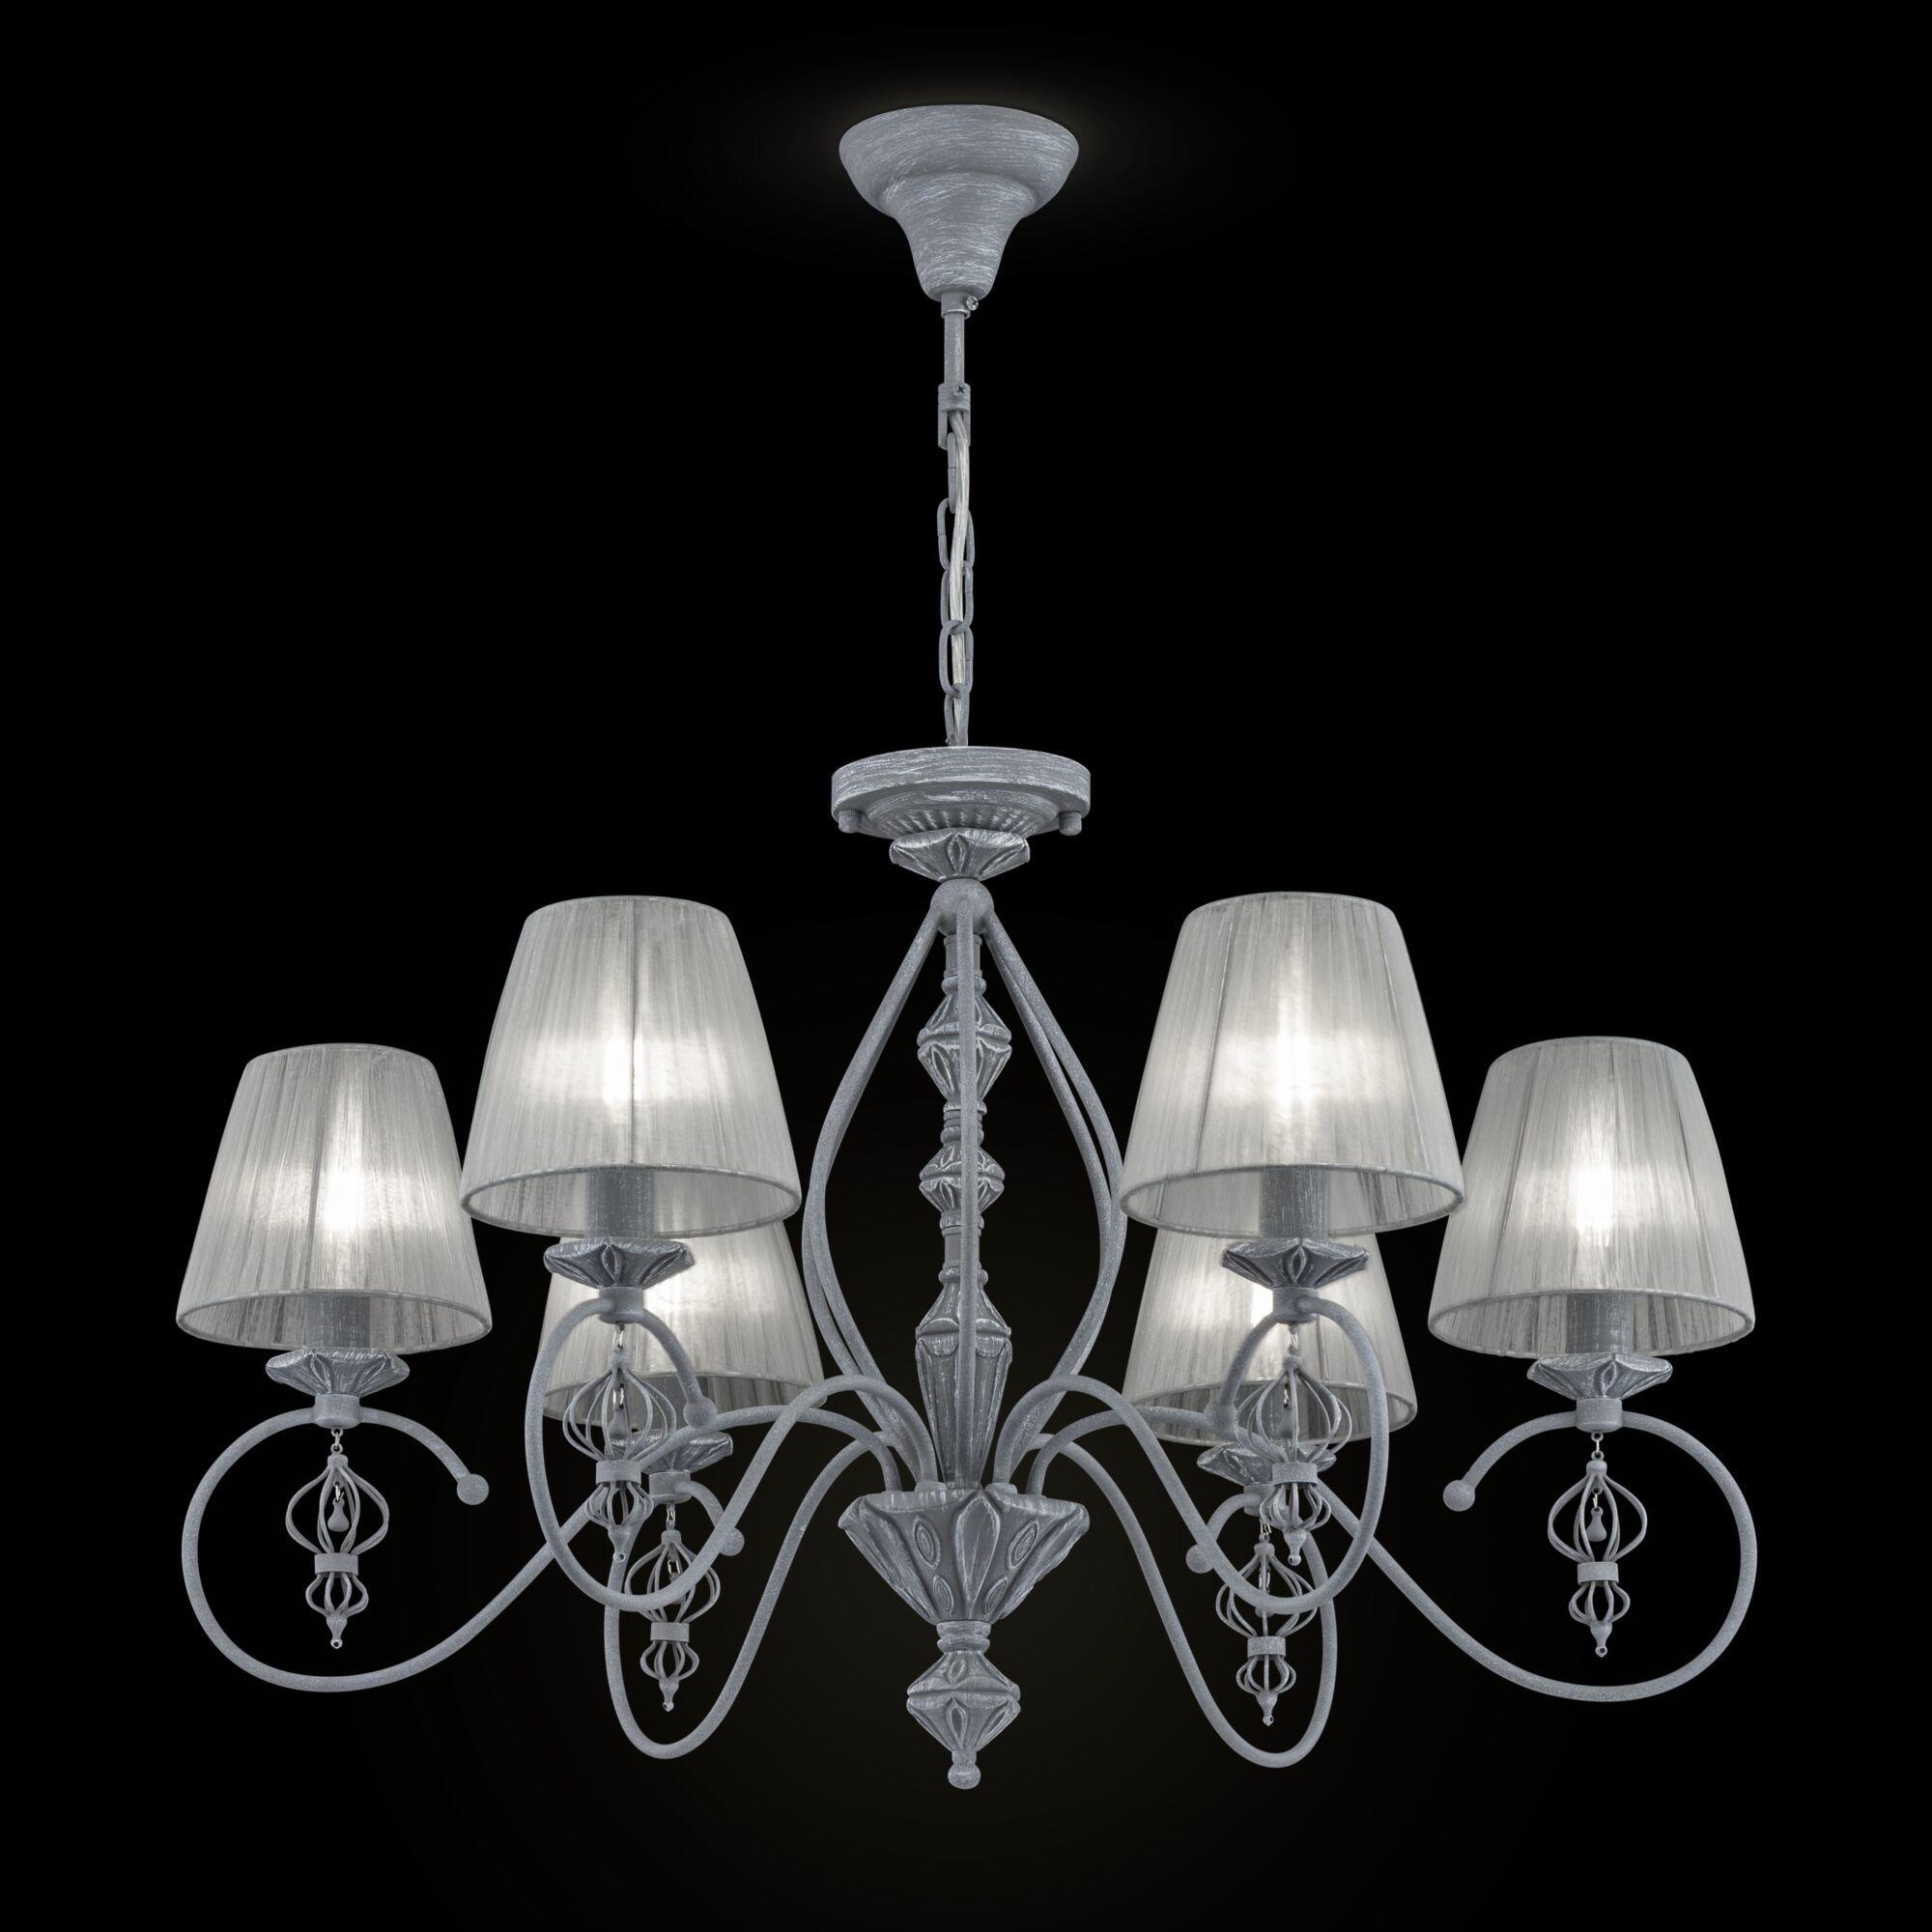 Потолочно-подвесная люстра Maytoni Classic Elegant Monsoon ARM154-06-S, 6xE14x40W, серый, металл, текстиль - фото 1